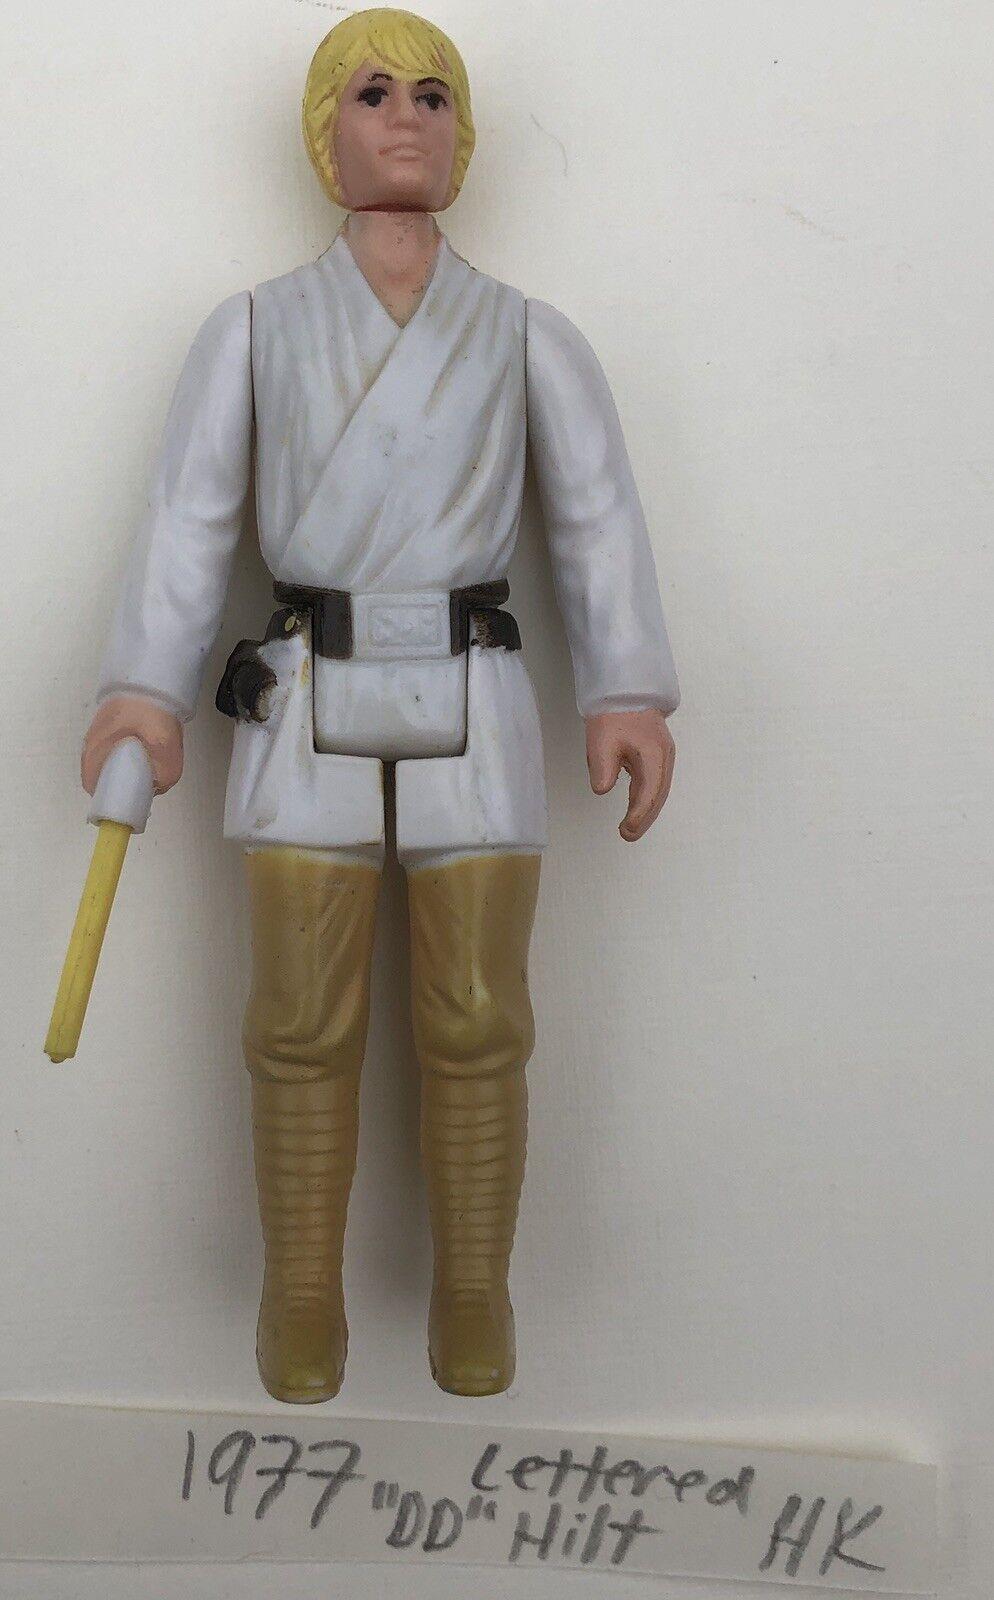 1977 Vintage Star Wars Luke Farmboy Action Figure Letterot Hilt Lightsaber Real